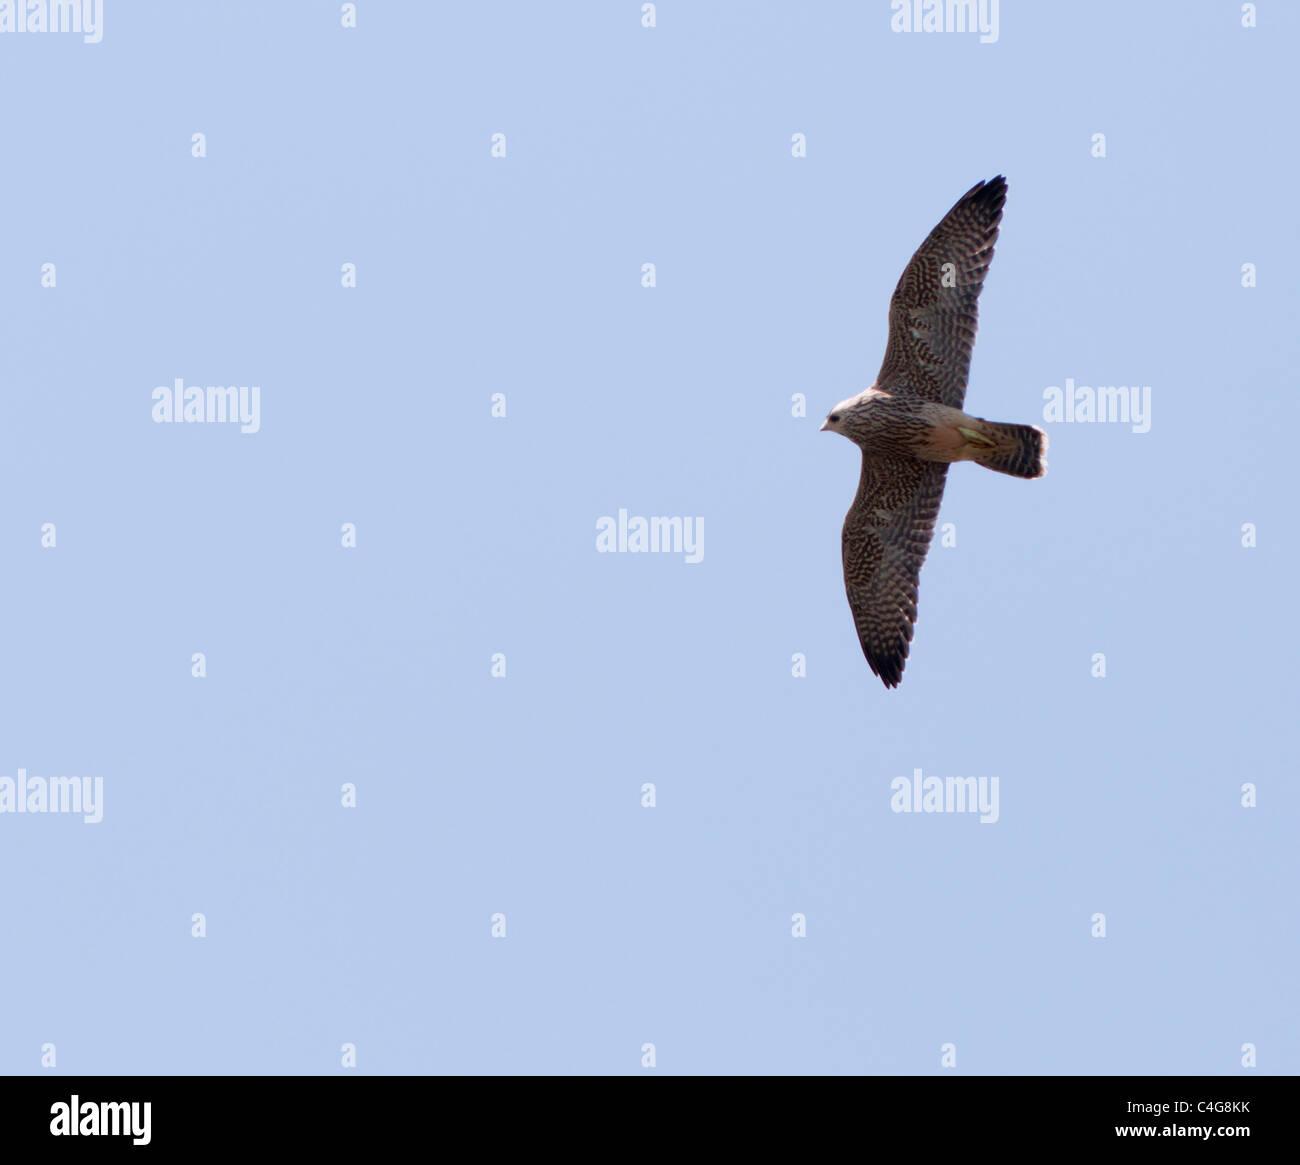 Juvenile Peregrine Falcon (Falco peregrinus) in flight above Lincoln Cathedral - Stock Image